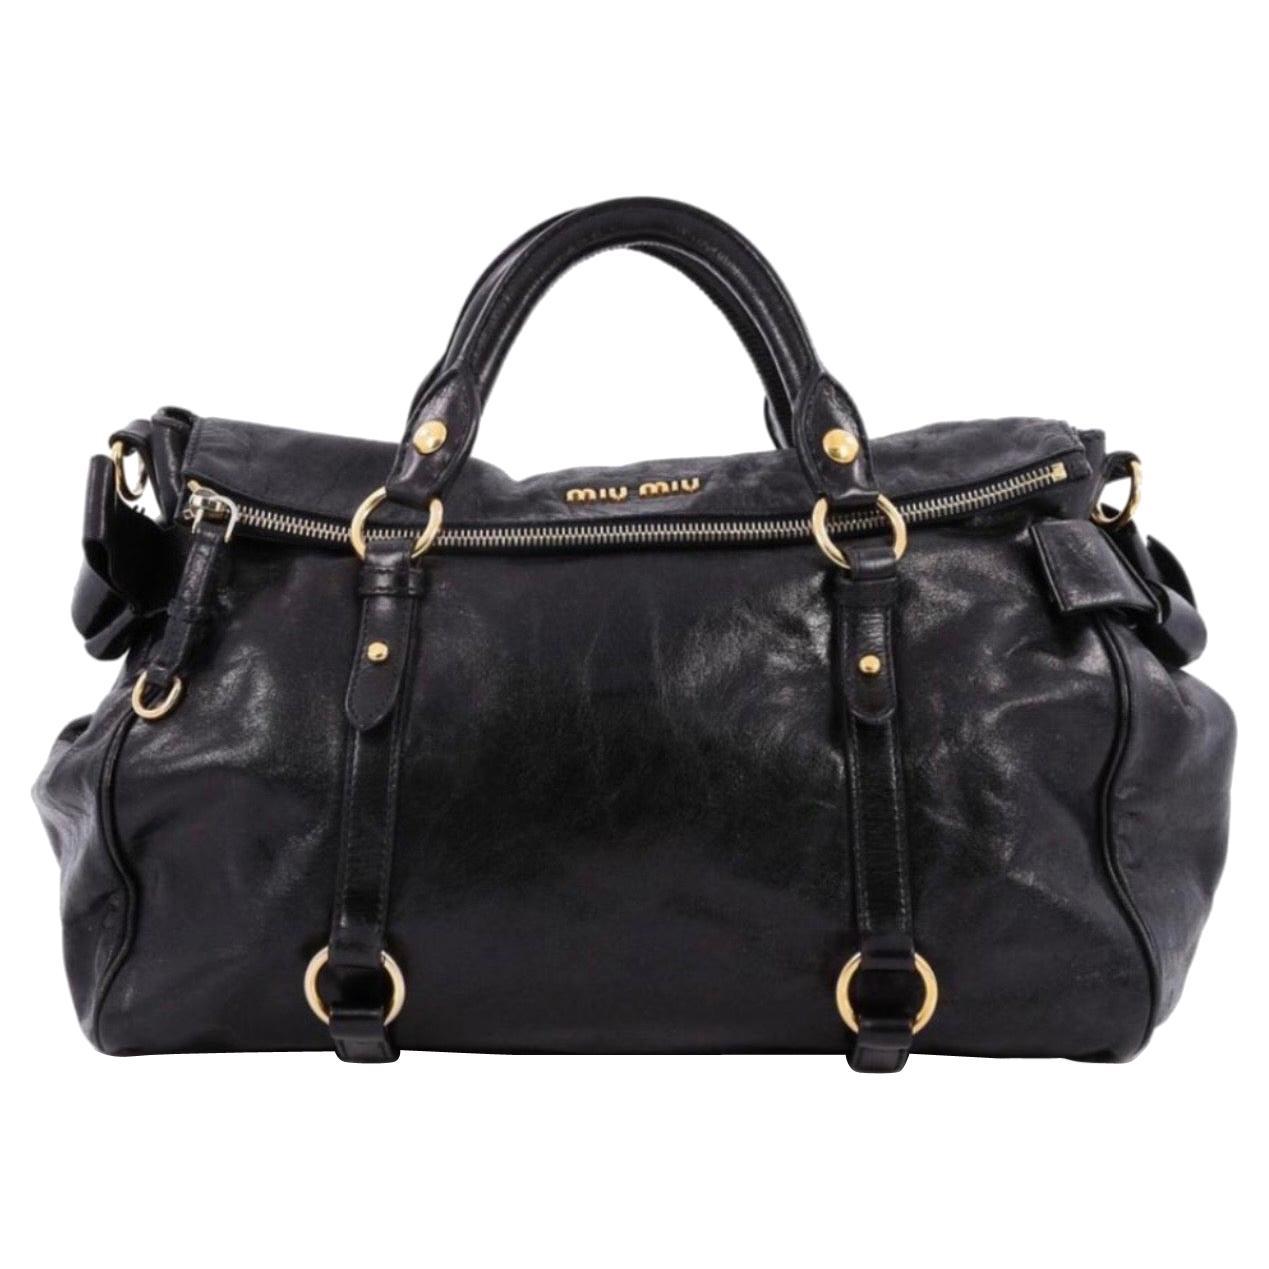 Miu Miu Prada Bow Vitello Lux Medium Calfskin Leather Satchel, Black, Bow bag